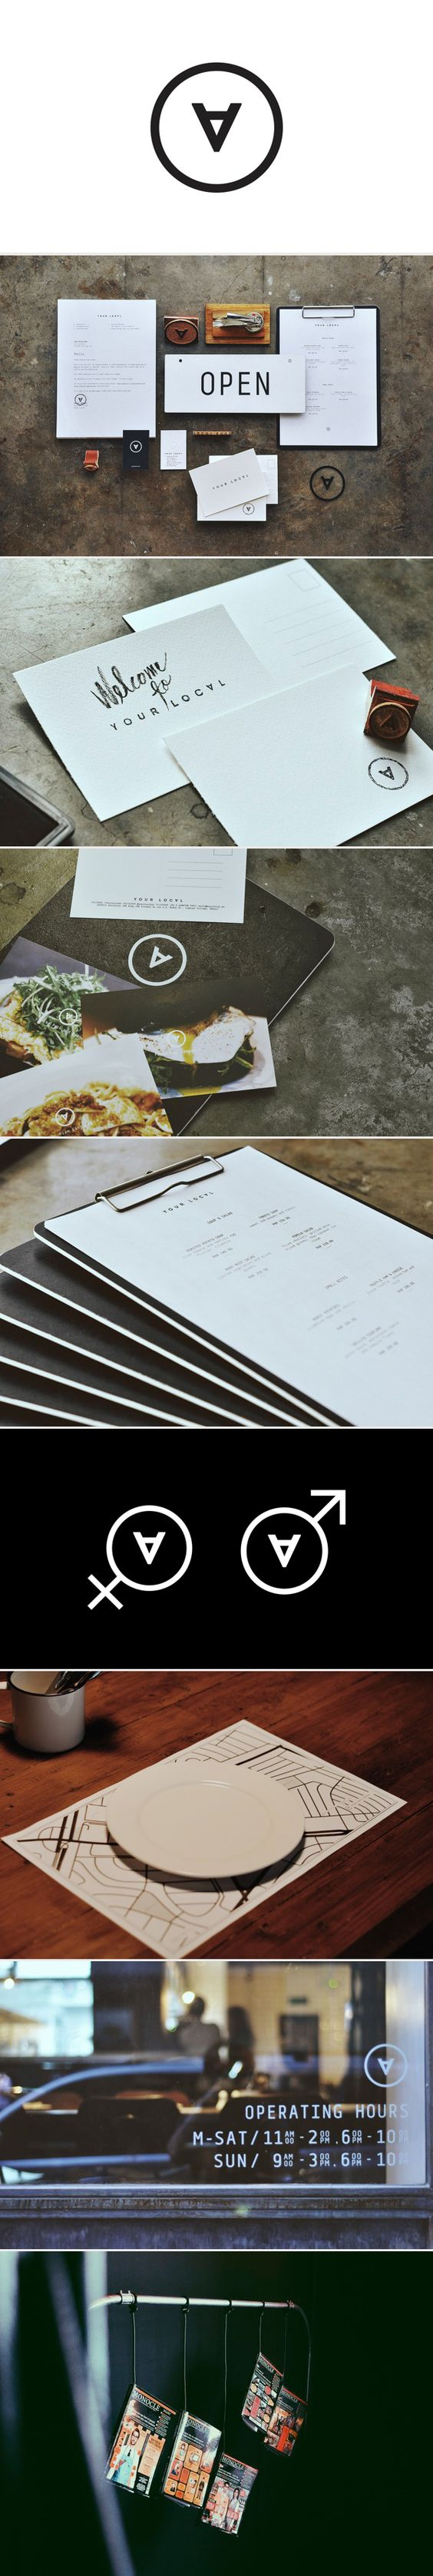 #Brand / #Identity design / #restaurant / #diseño #marca